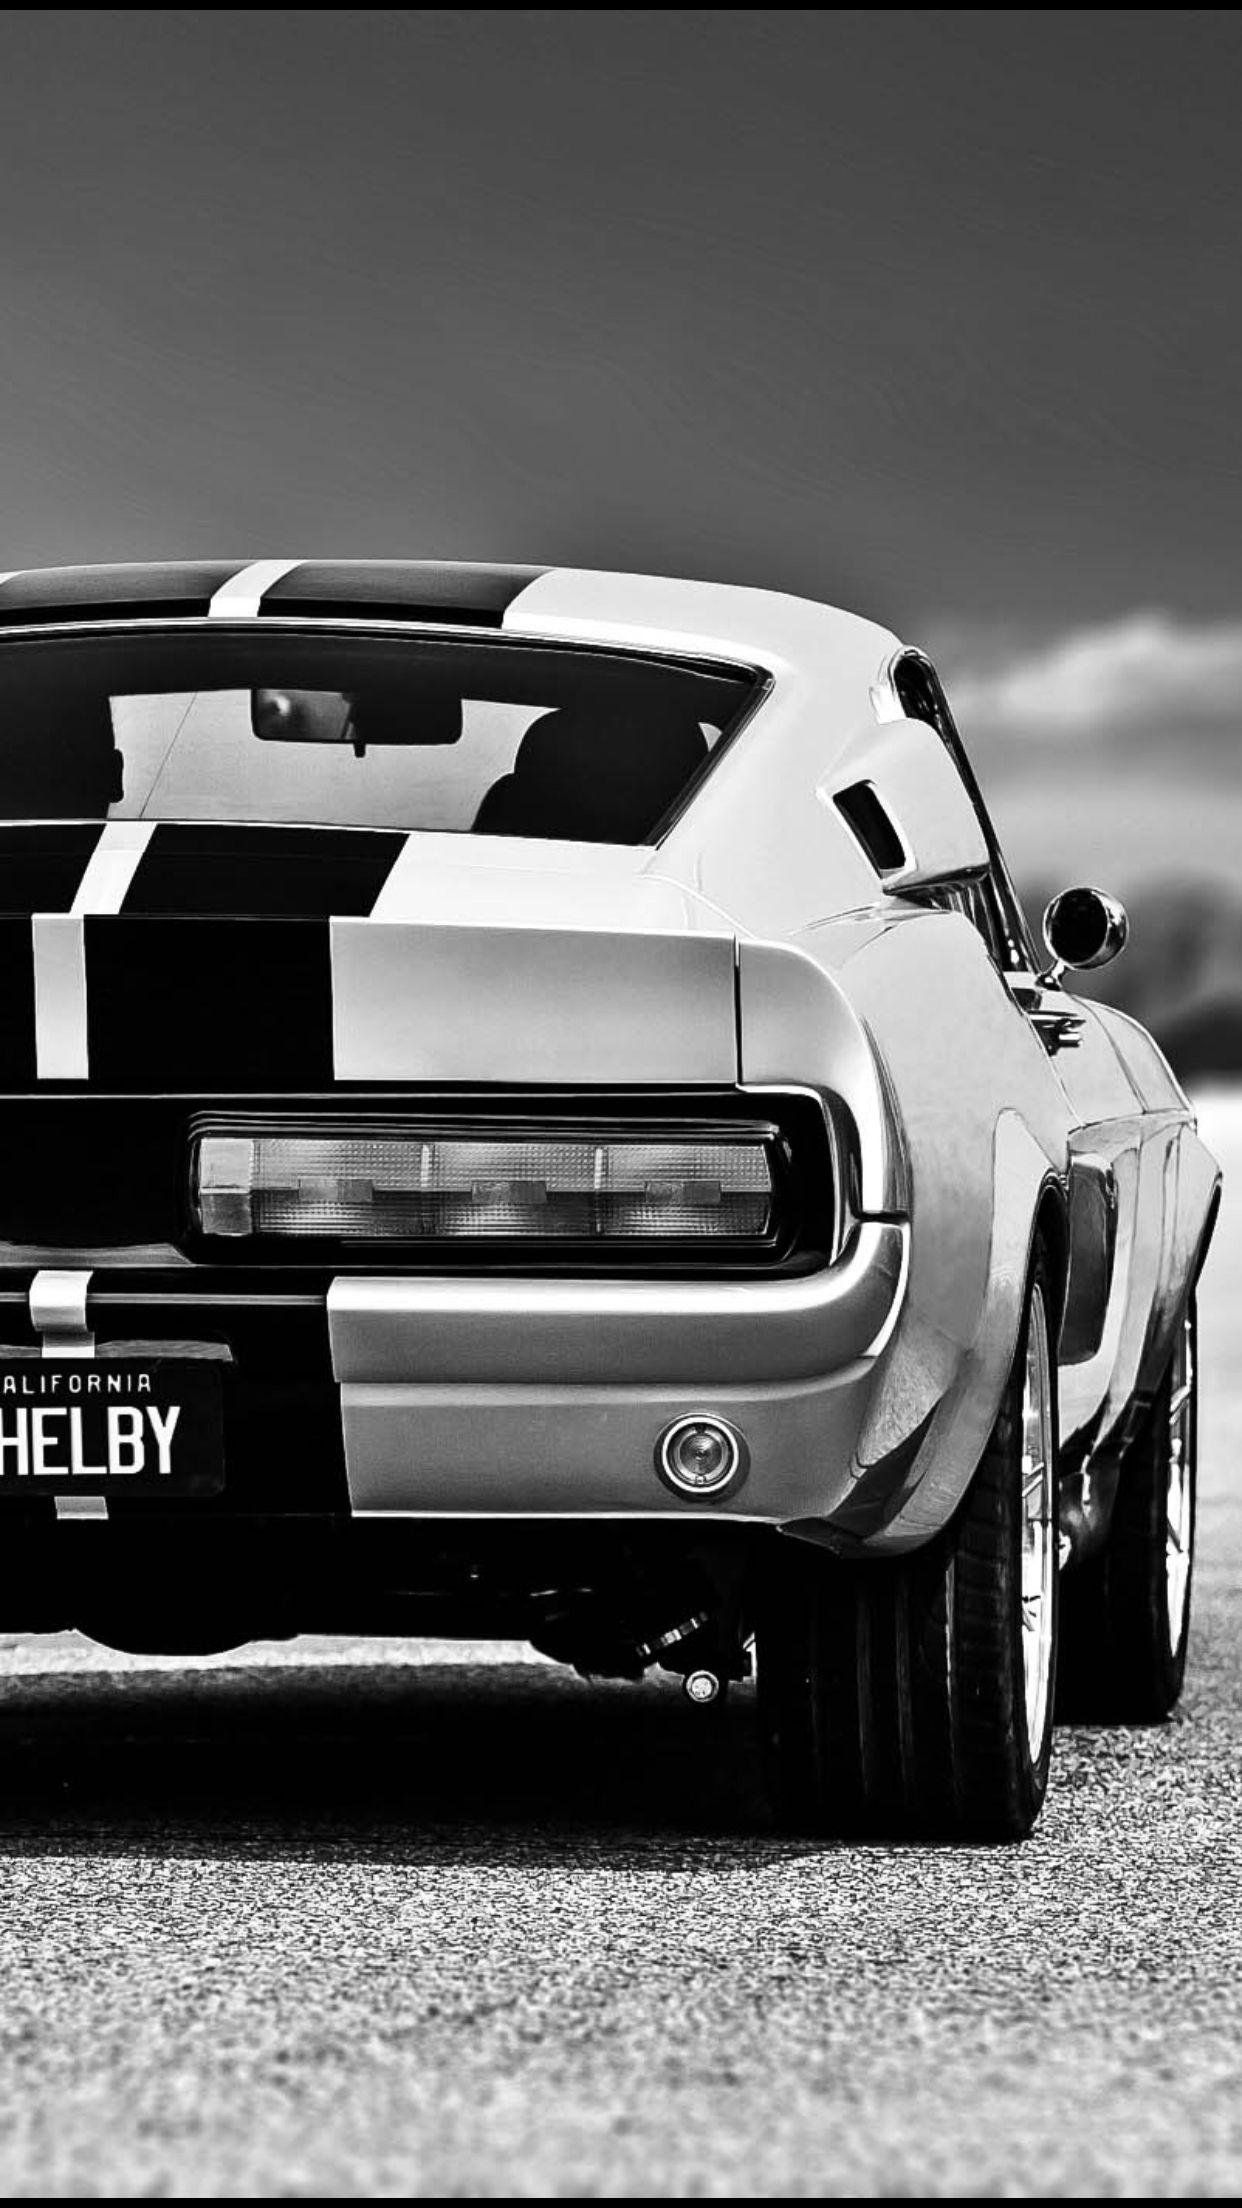 Mustang shelby 500 gt eleanor